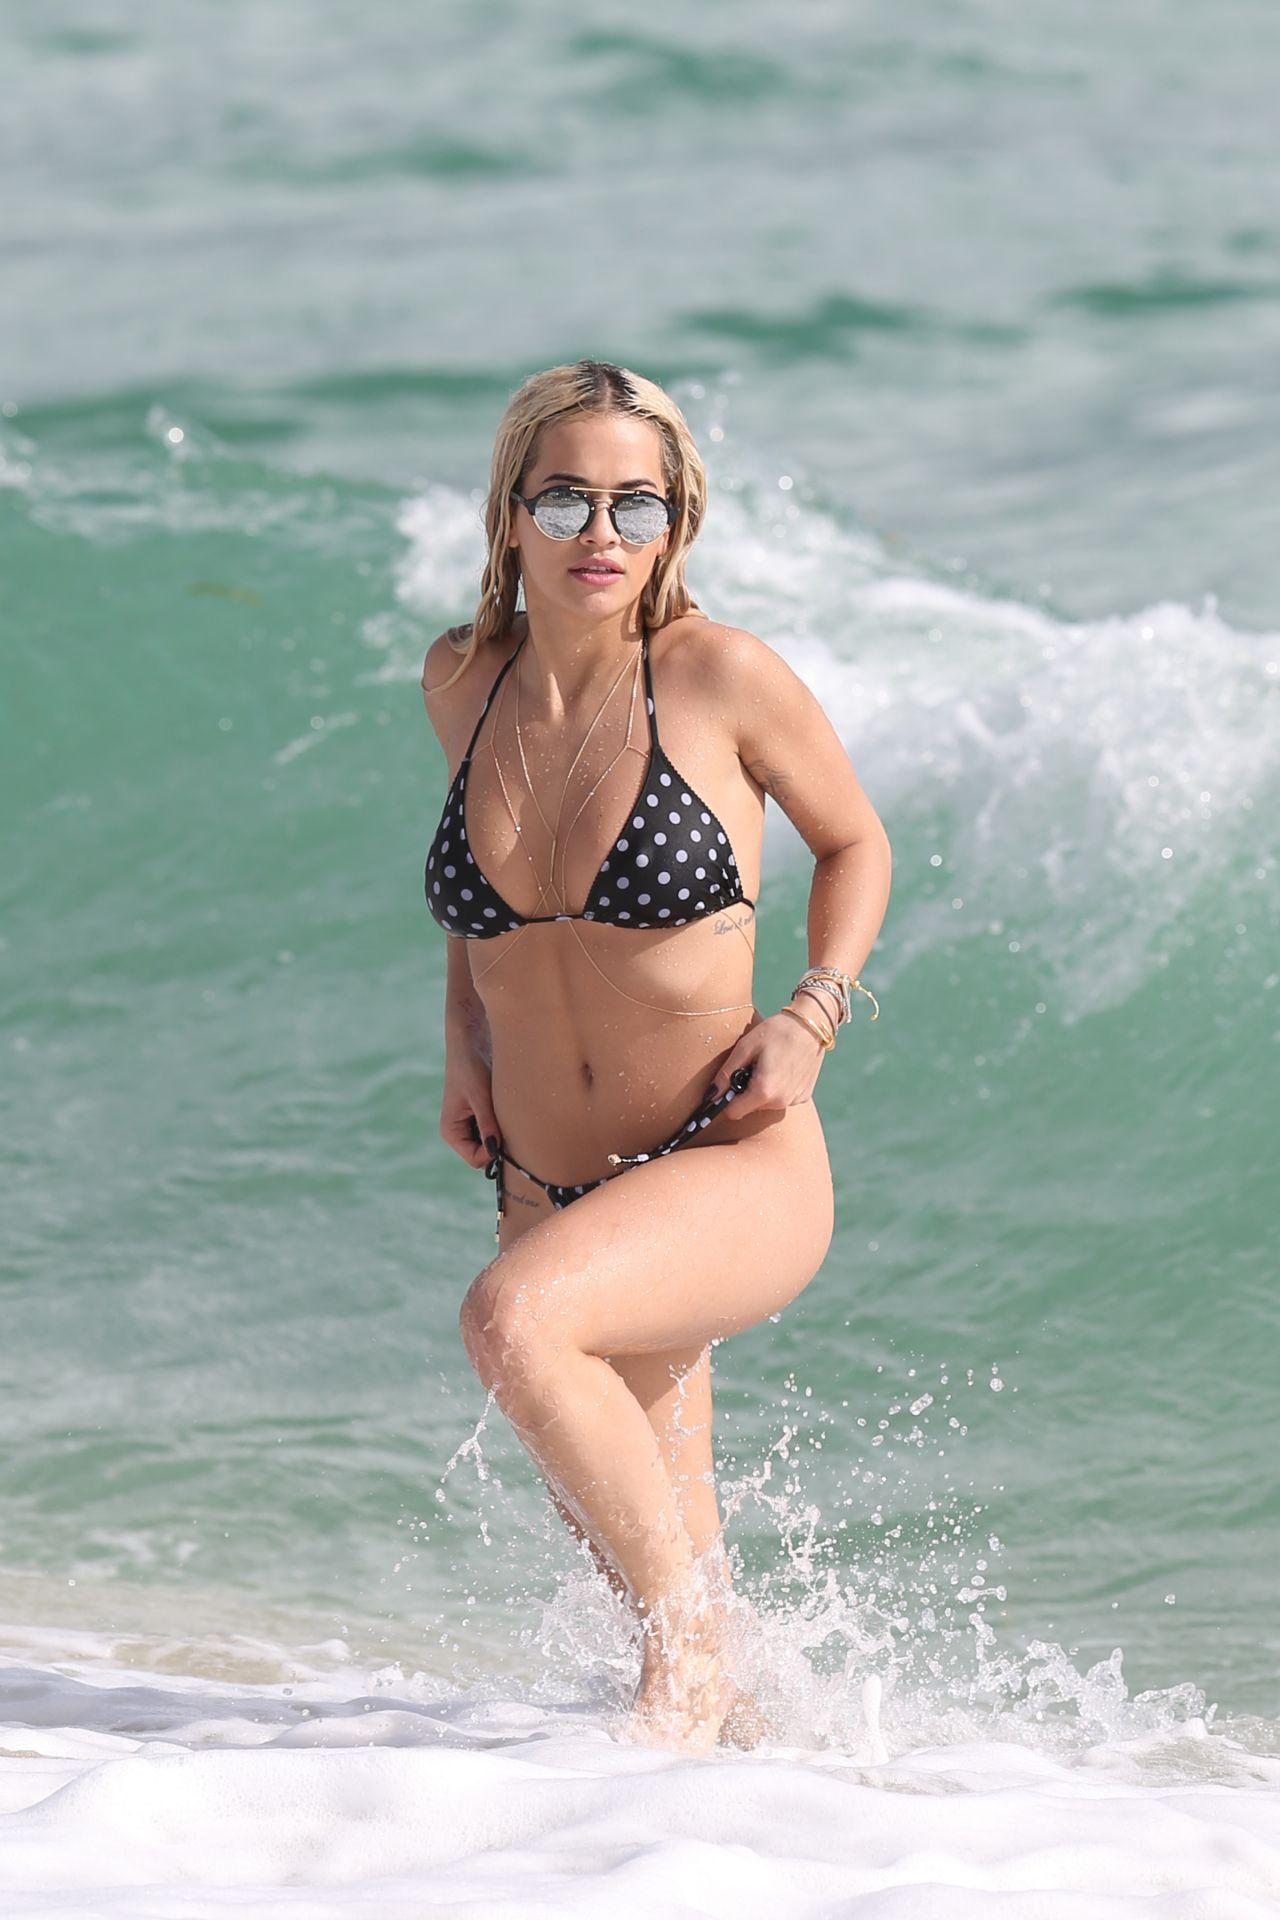 Basil Brush Hates Gypsies Homosexuals Hot clip CelebGate Ashley Resch Nude Sexy -,Strellakat naked